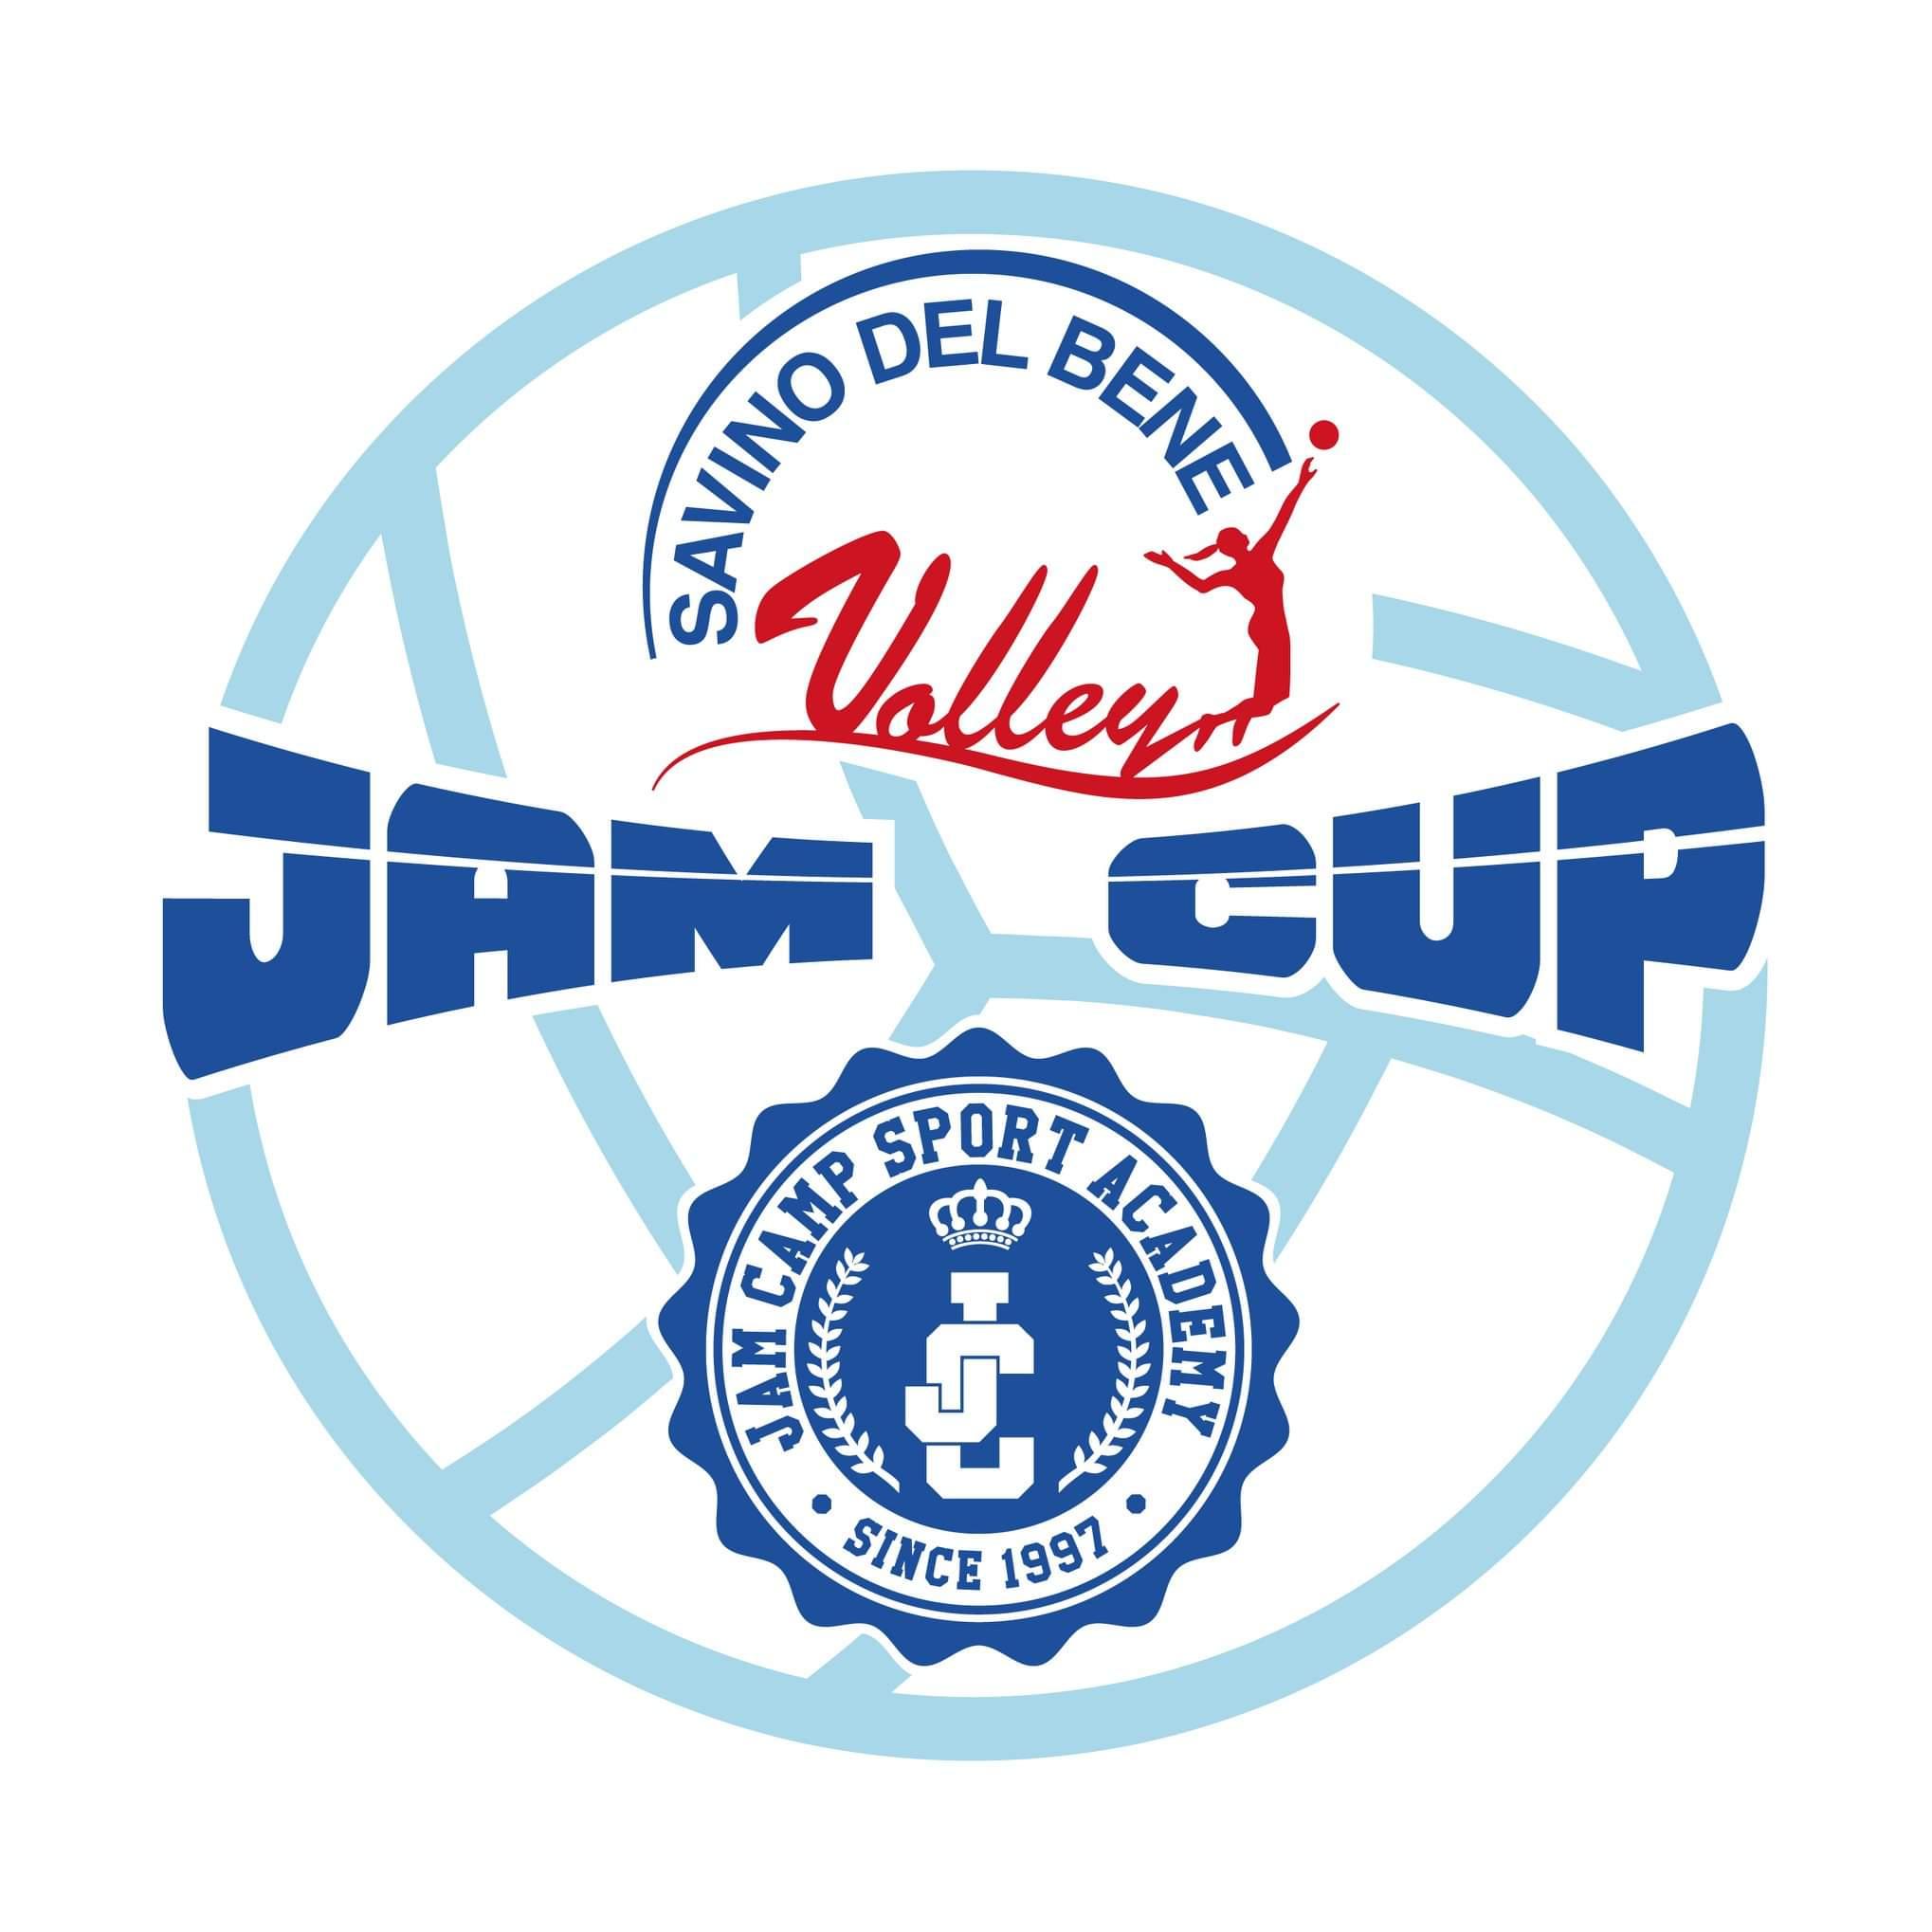 Savino Del Bene Volley Jam Cup!